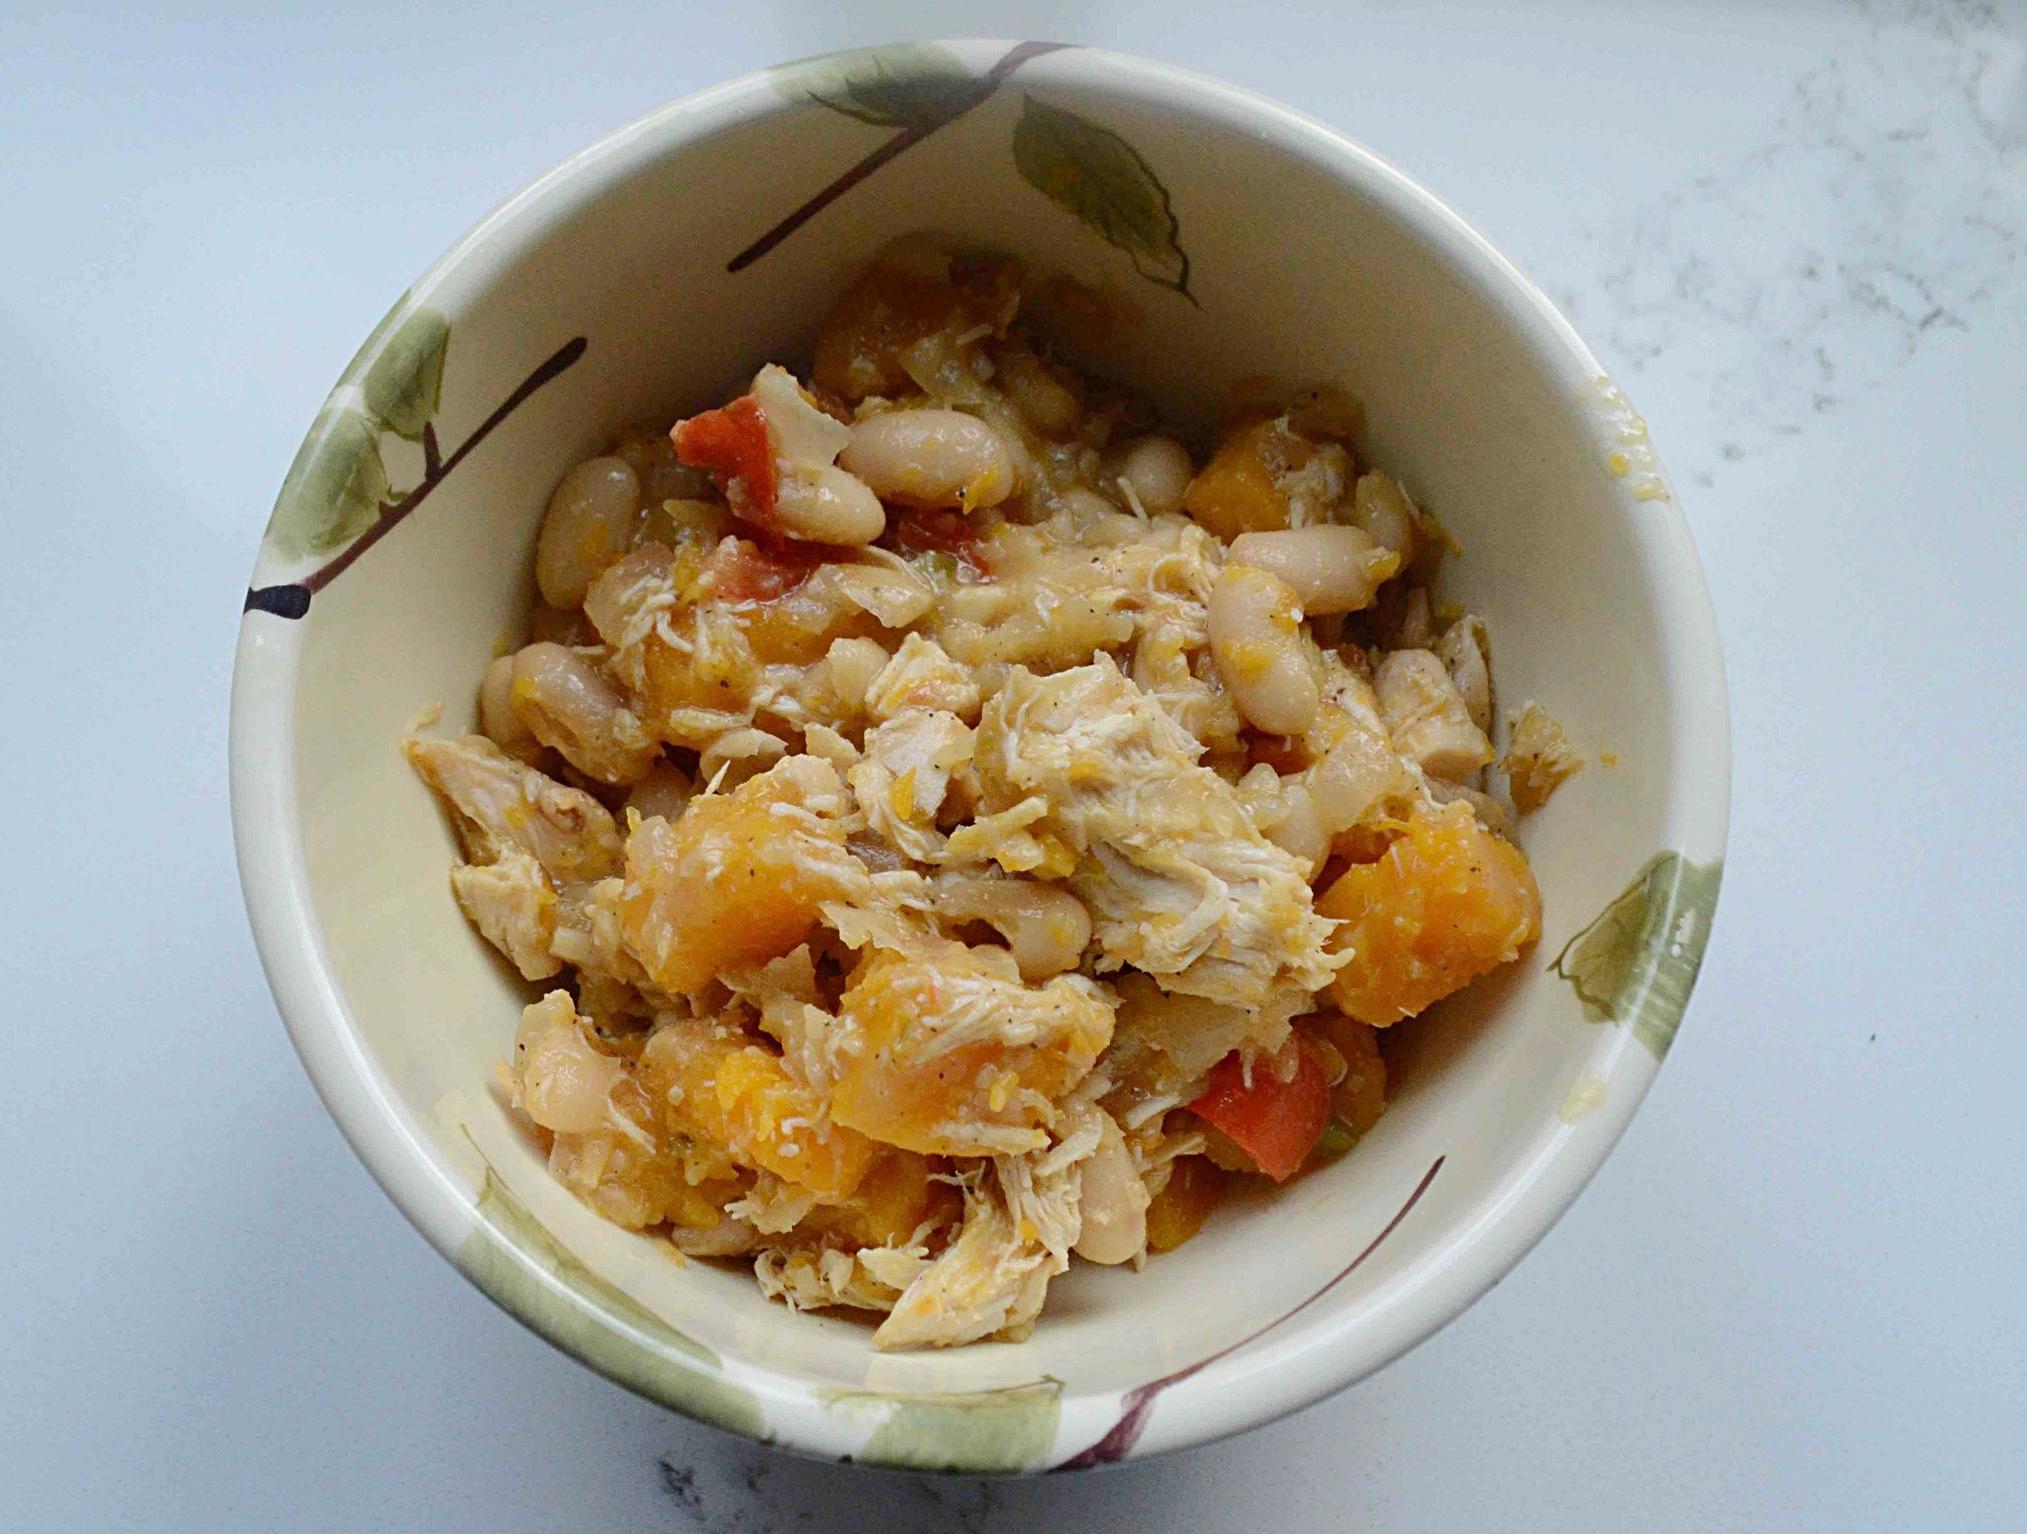 Easy Chicken and Butternut Squash Chili